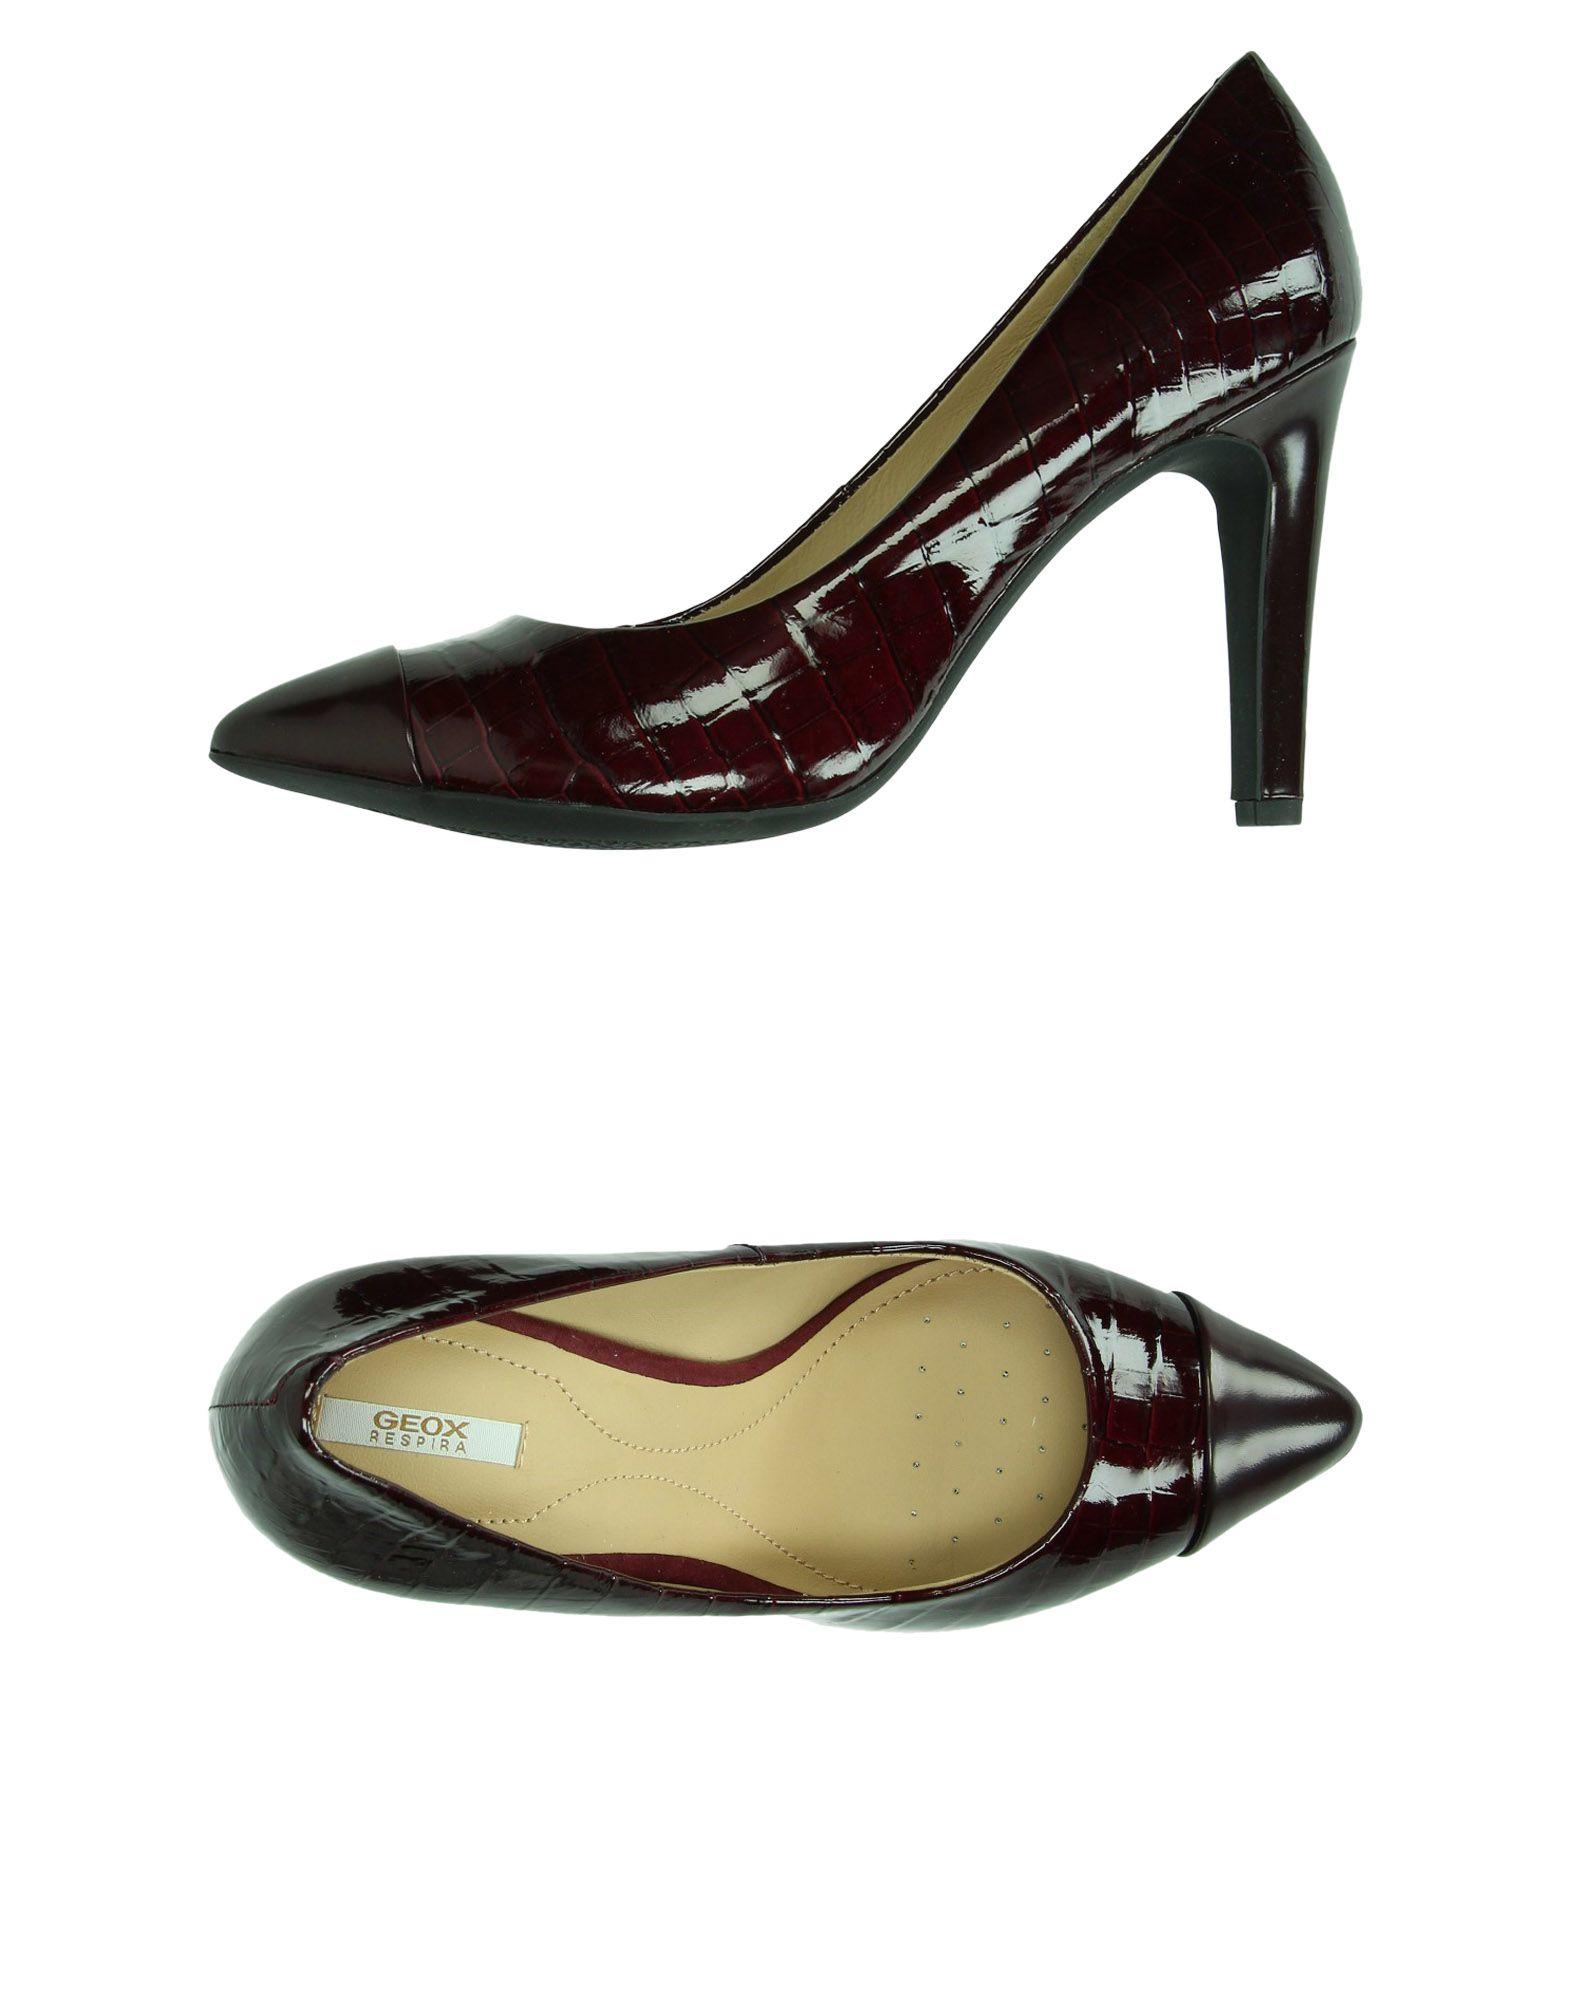 Geox Shoes Australia Narrow